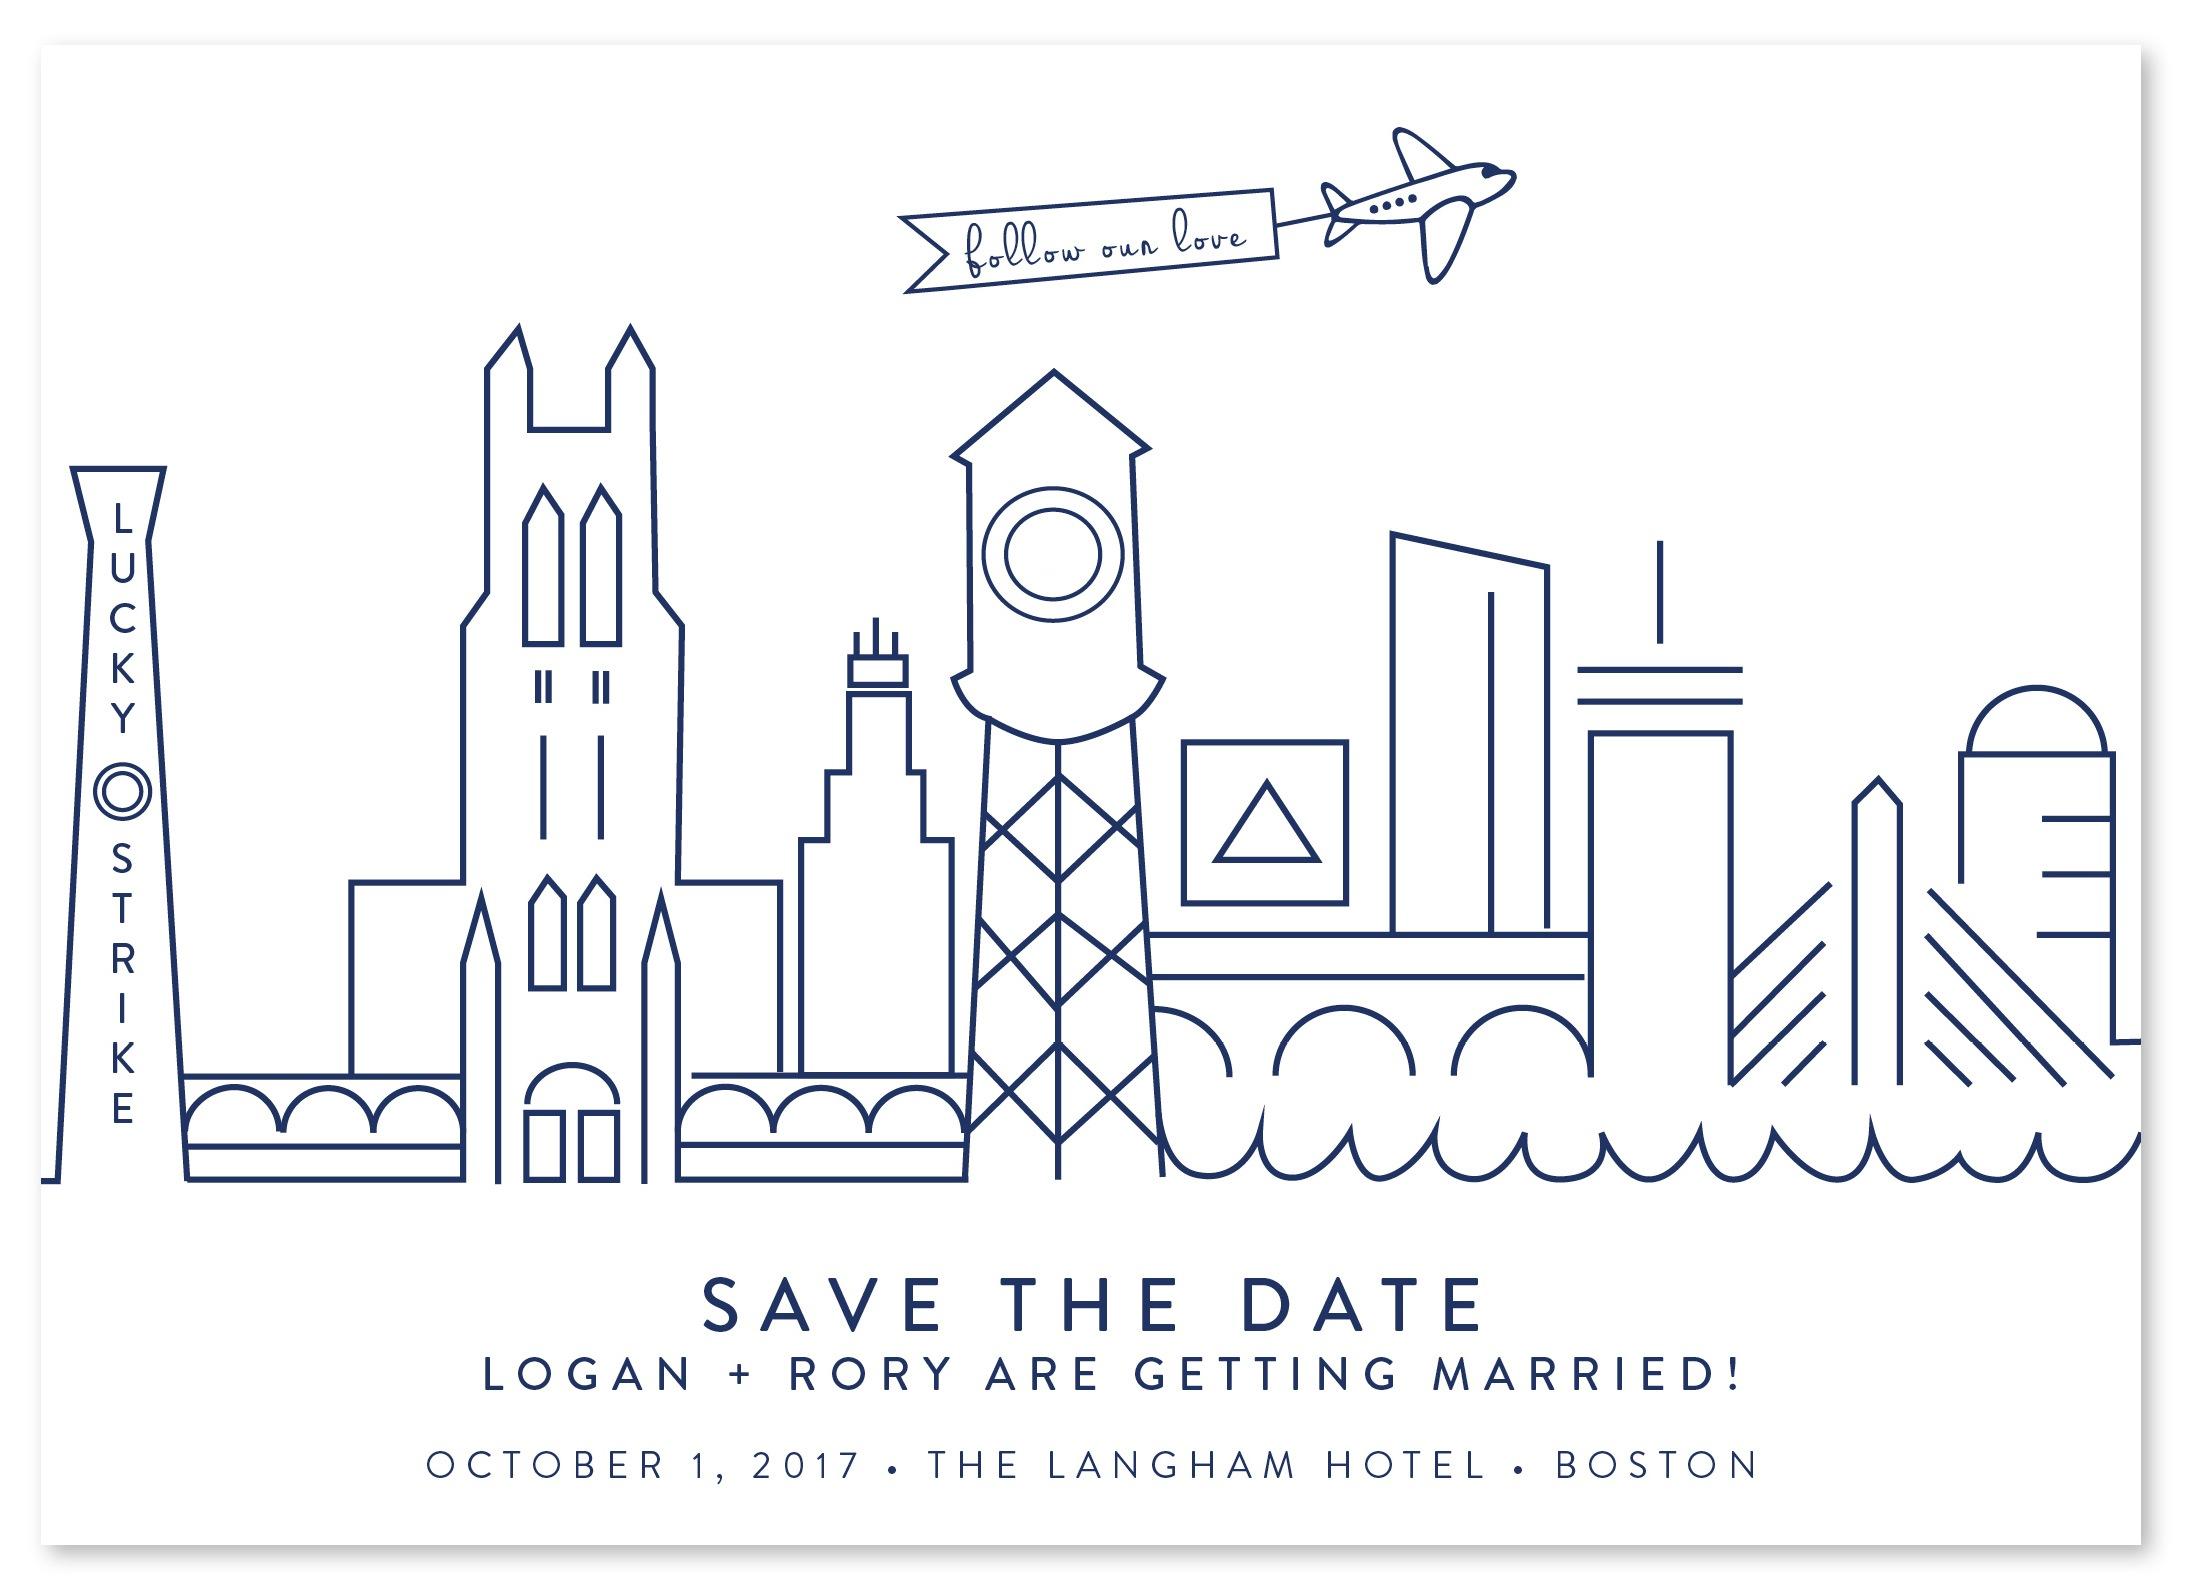 2017 wedding stationery ideas